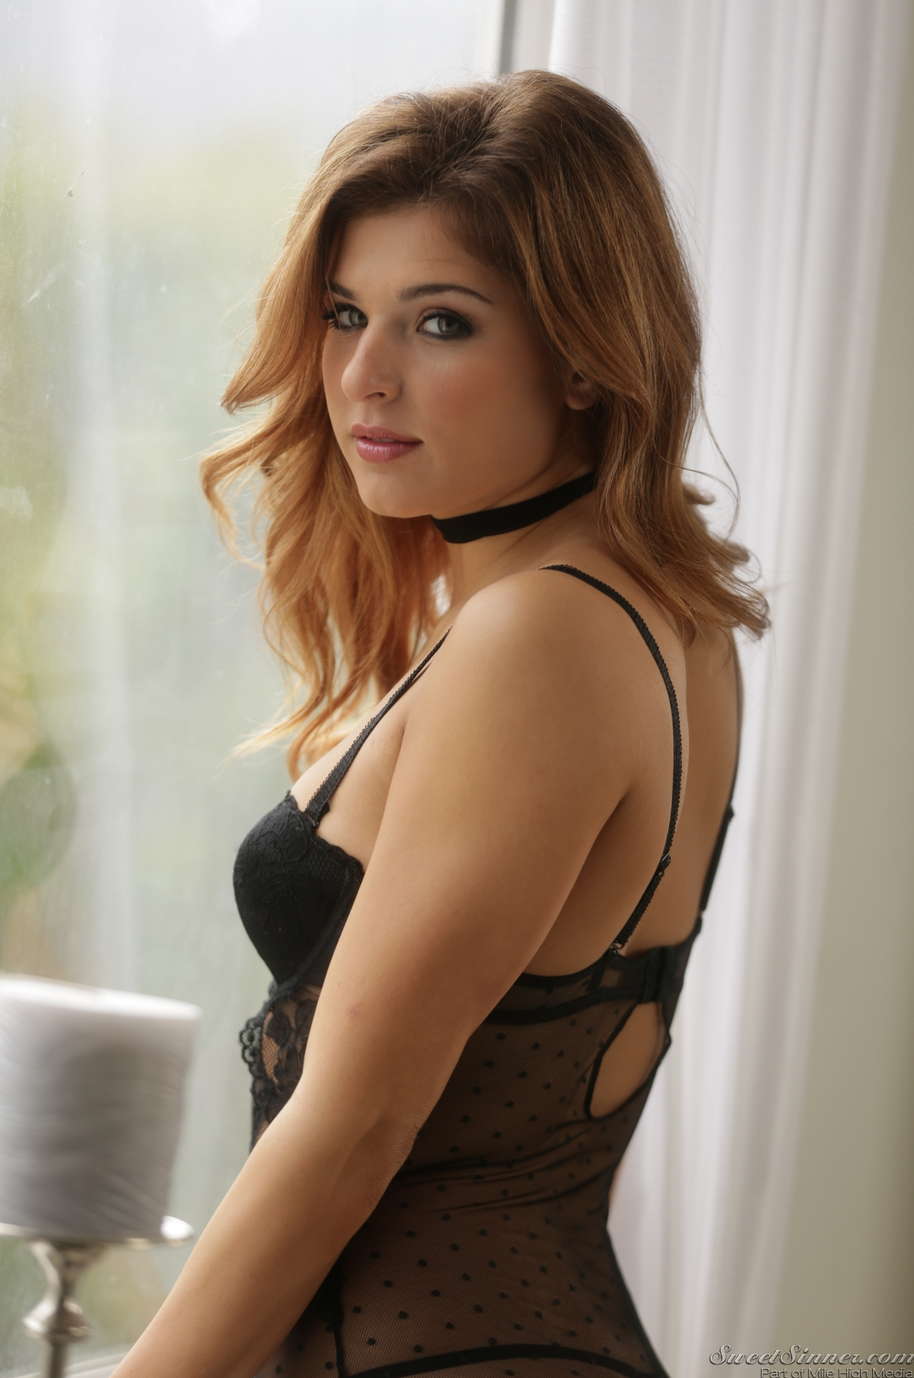 Sideboobs Mica Arganaraz nude (49 photos), Pussy, Paparazzi, Boobs, braless 2019